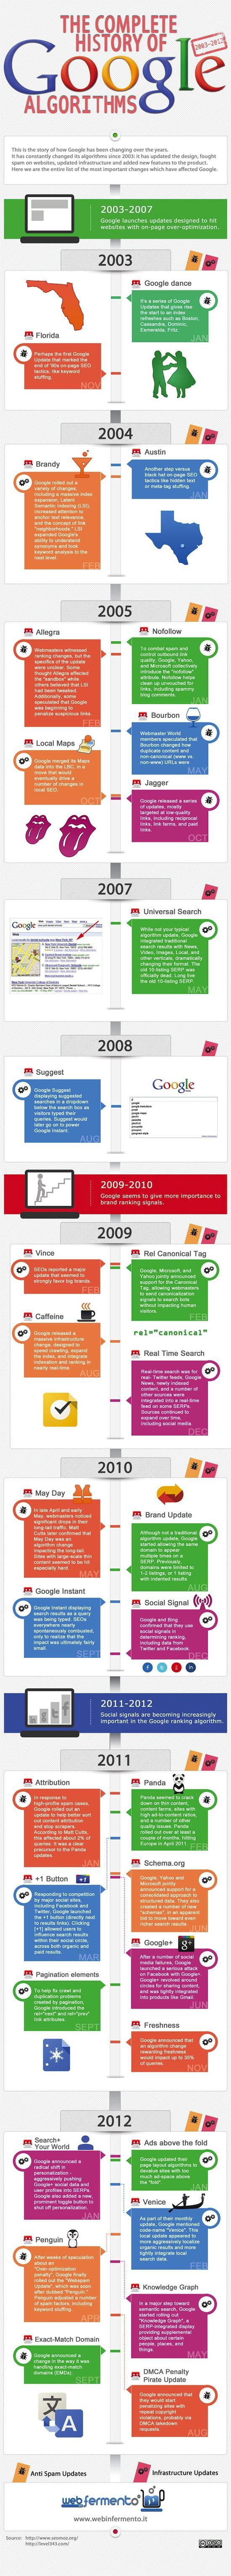 Google-Algorithms-History-of-Update